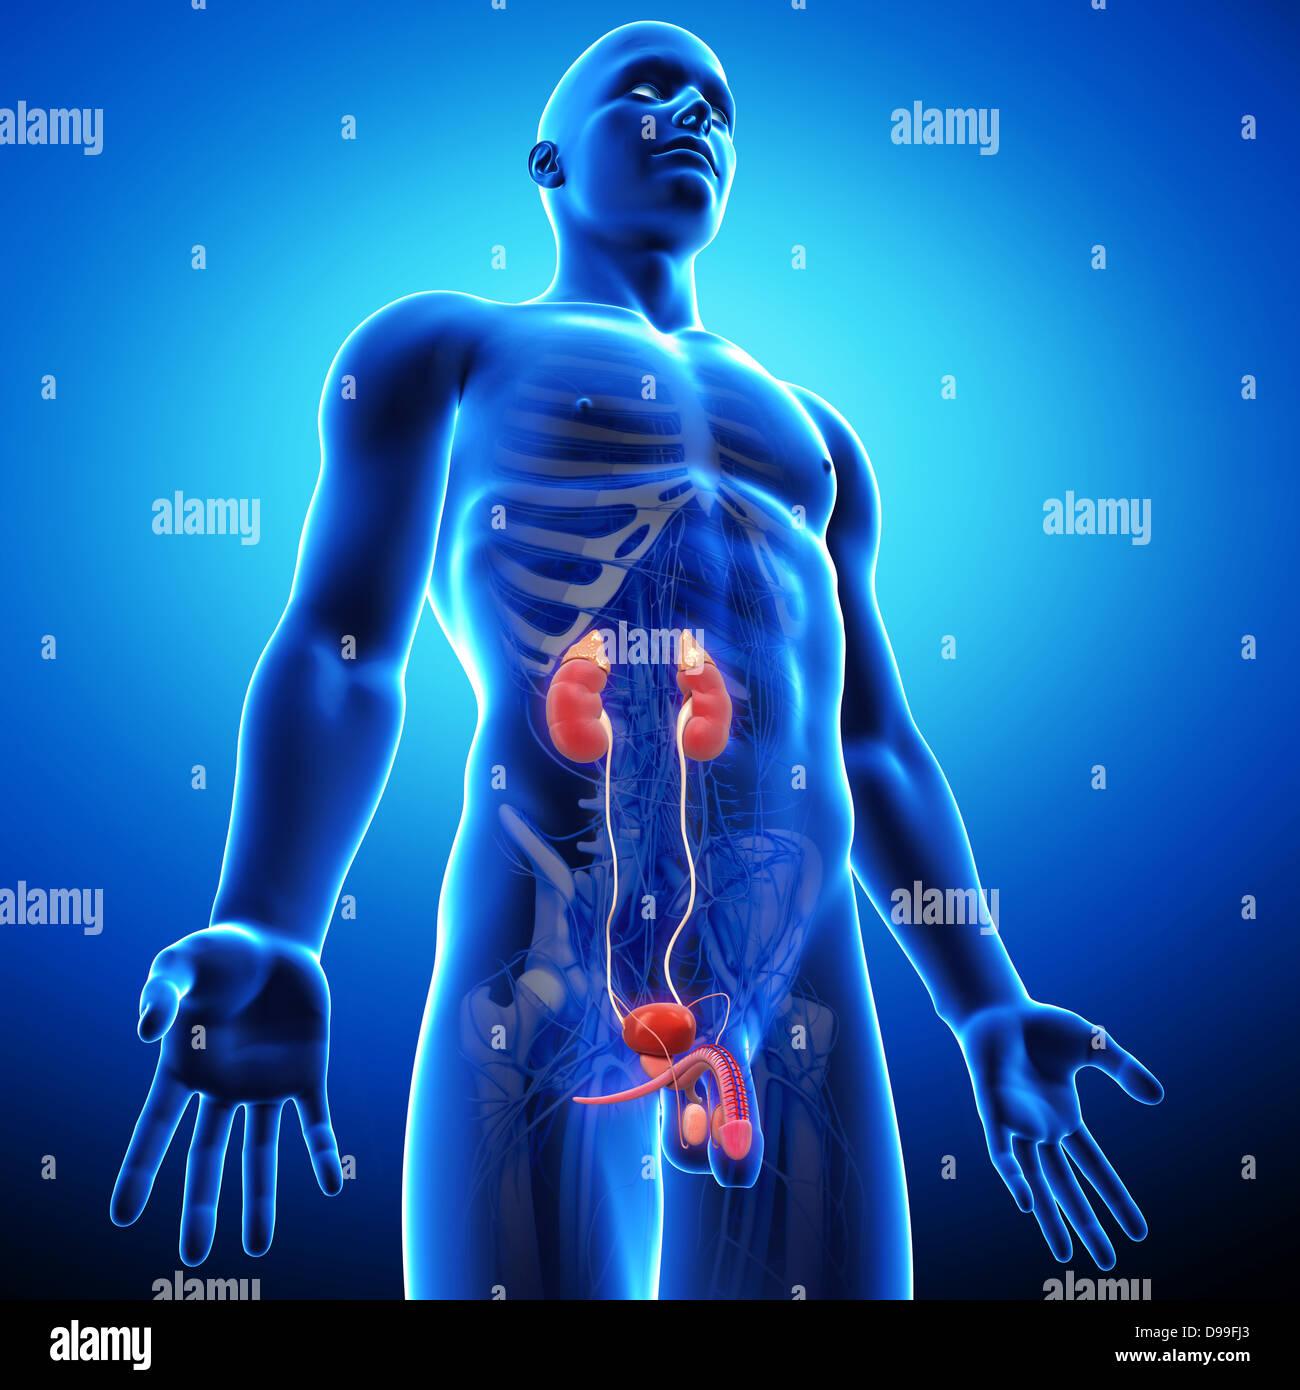 Male Urinary System Stockfotos & Male Urinary System Bilder - Alamy